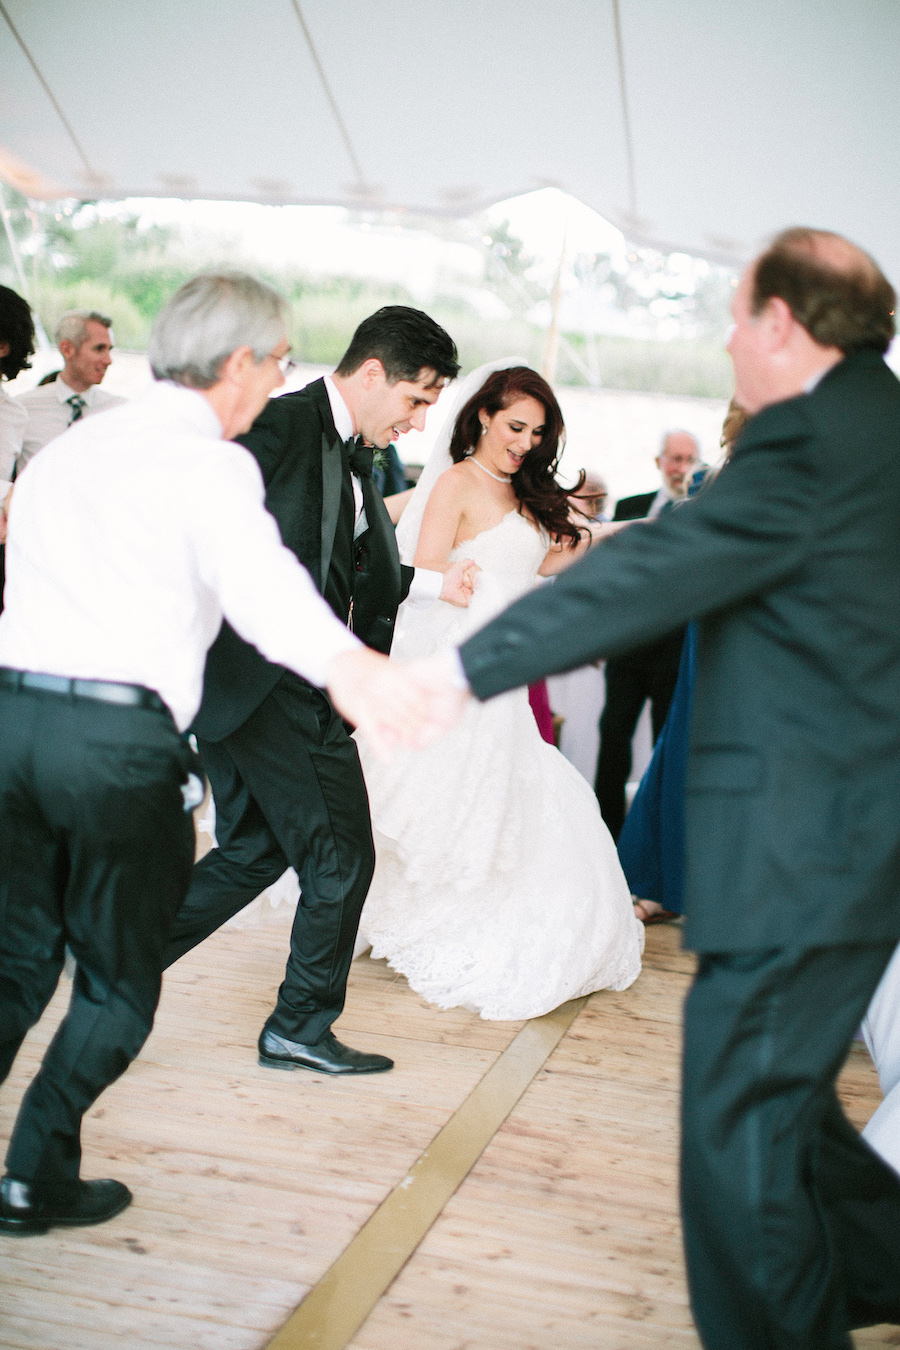 saya-photography-jewish-wedding-provence-rustic-lourmarin-le-galinier-46.jpg